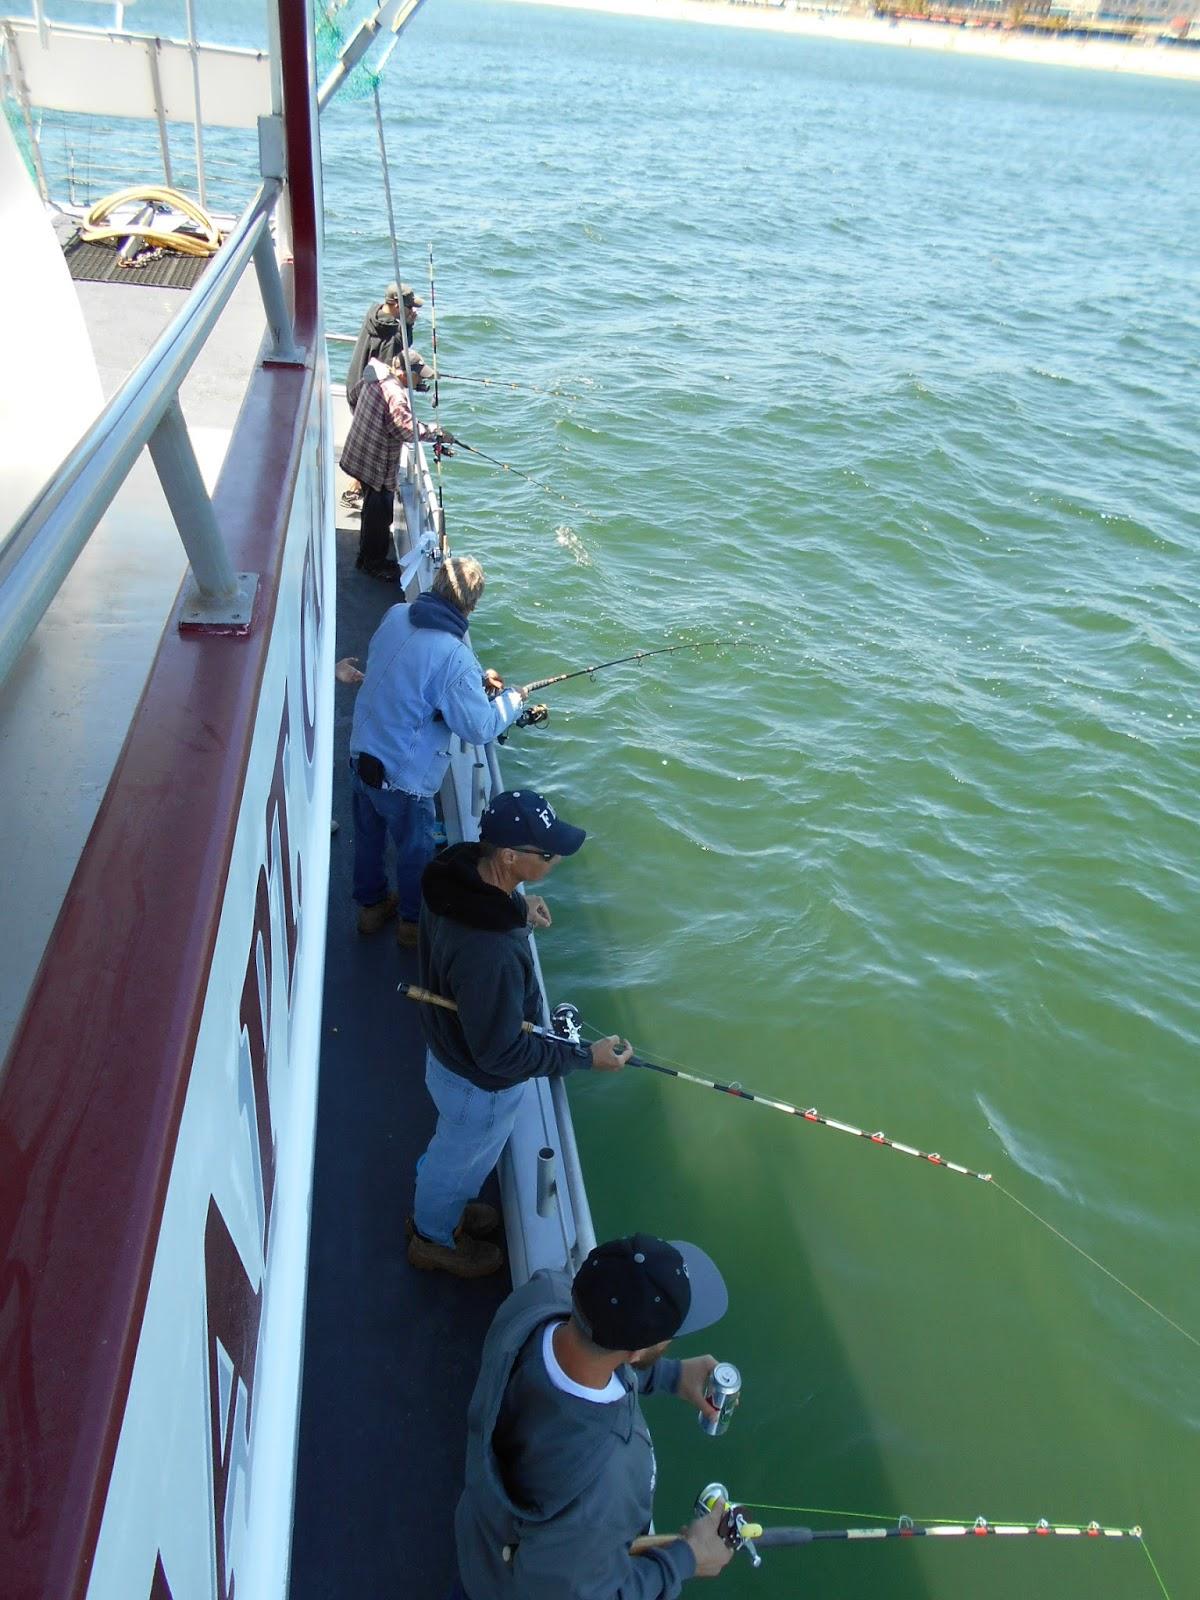 Nj salt fish 2016 06 12 captain cal belmar for Belmar nj fishing report